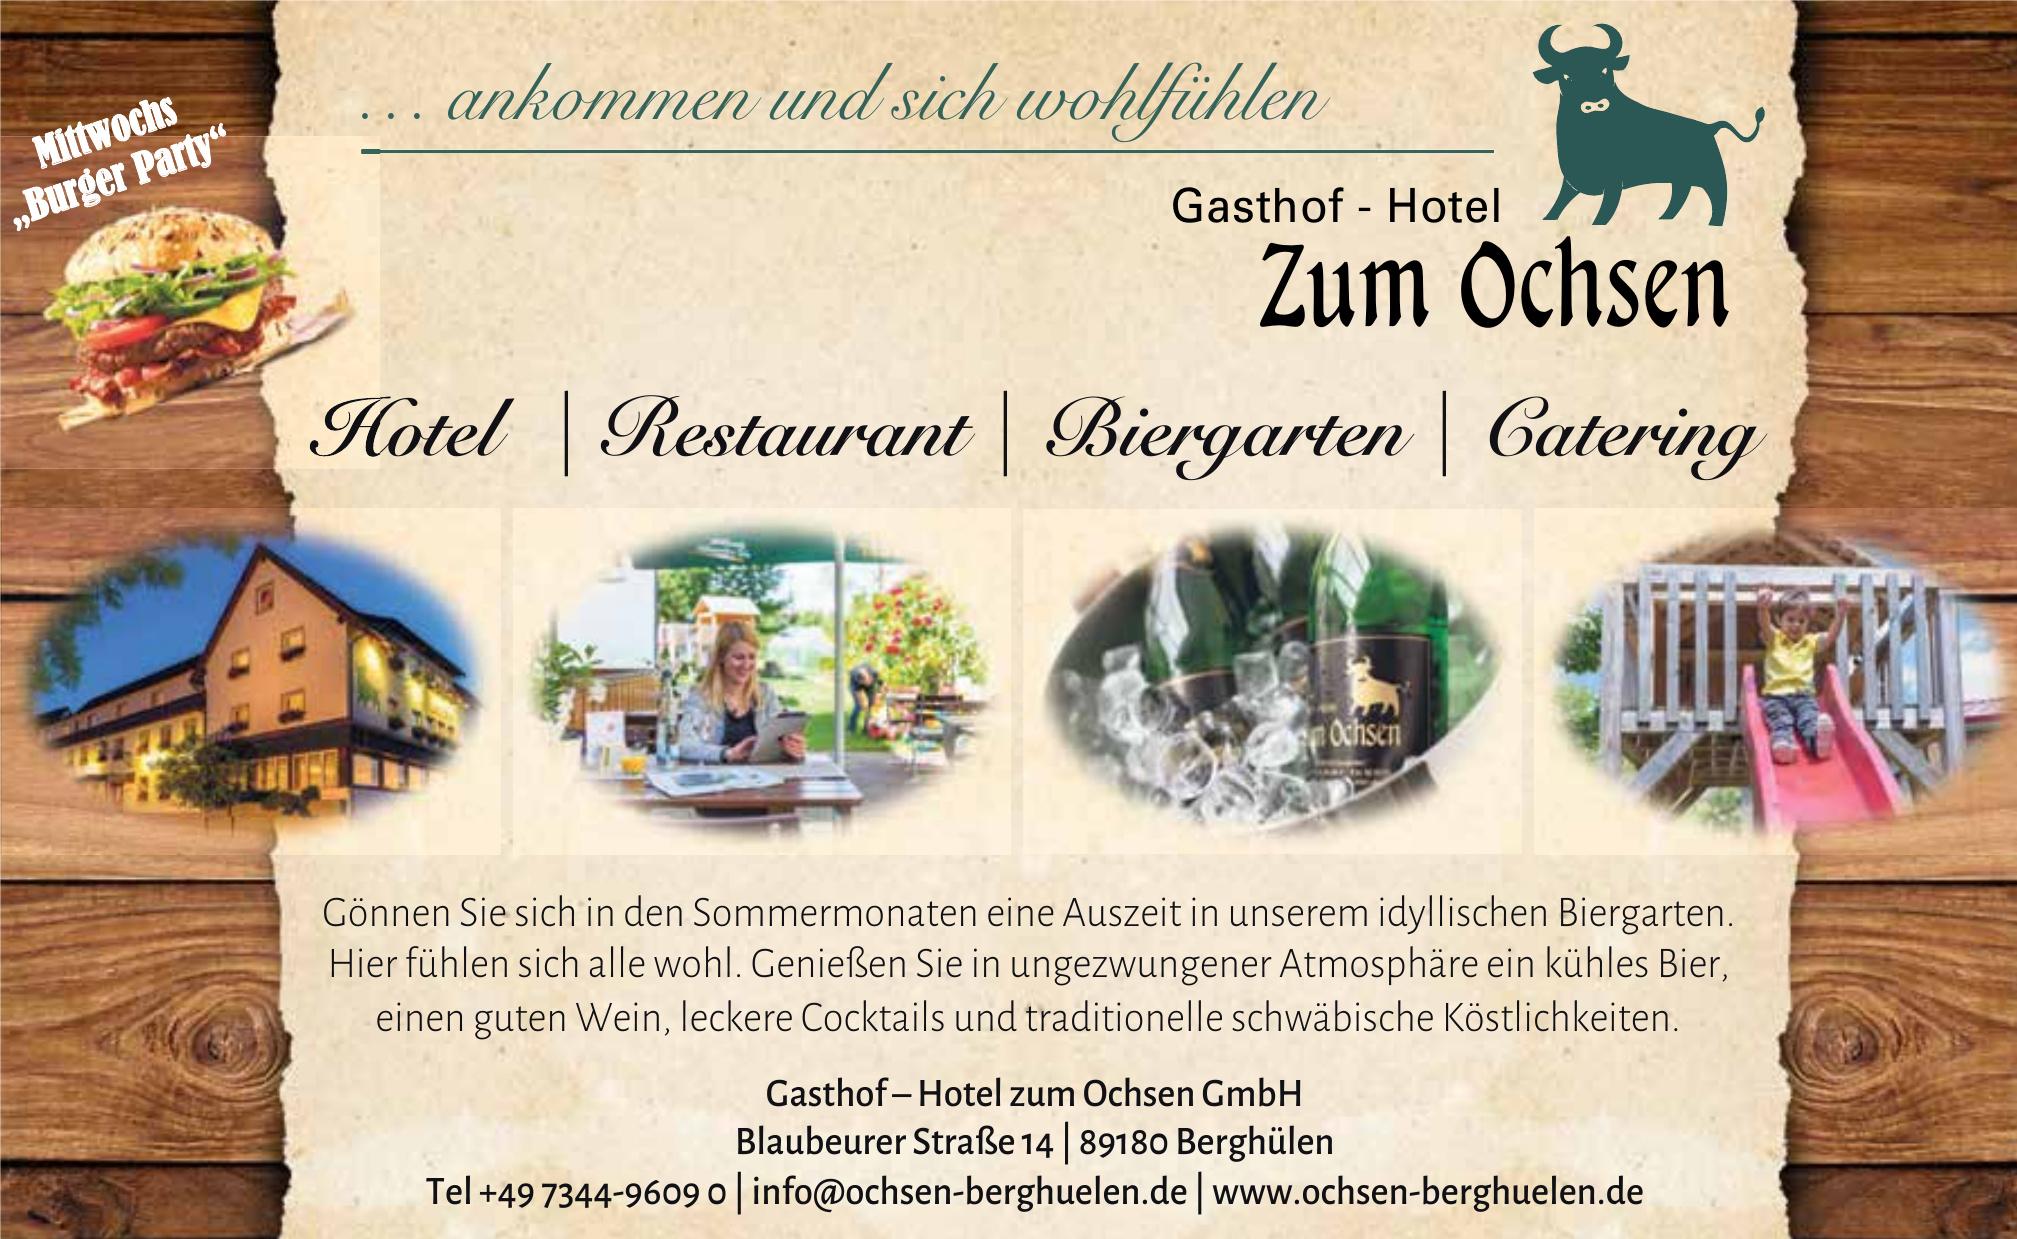 Gasthof – Hotel zum Ochsen GmbH